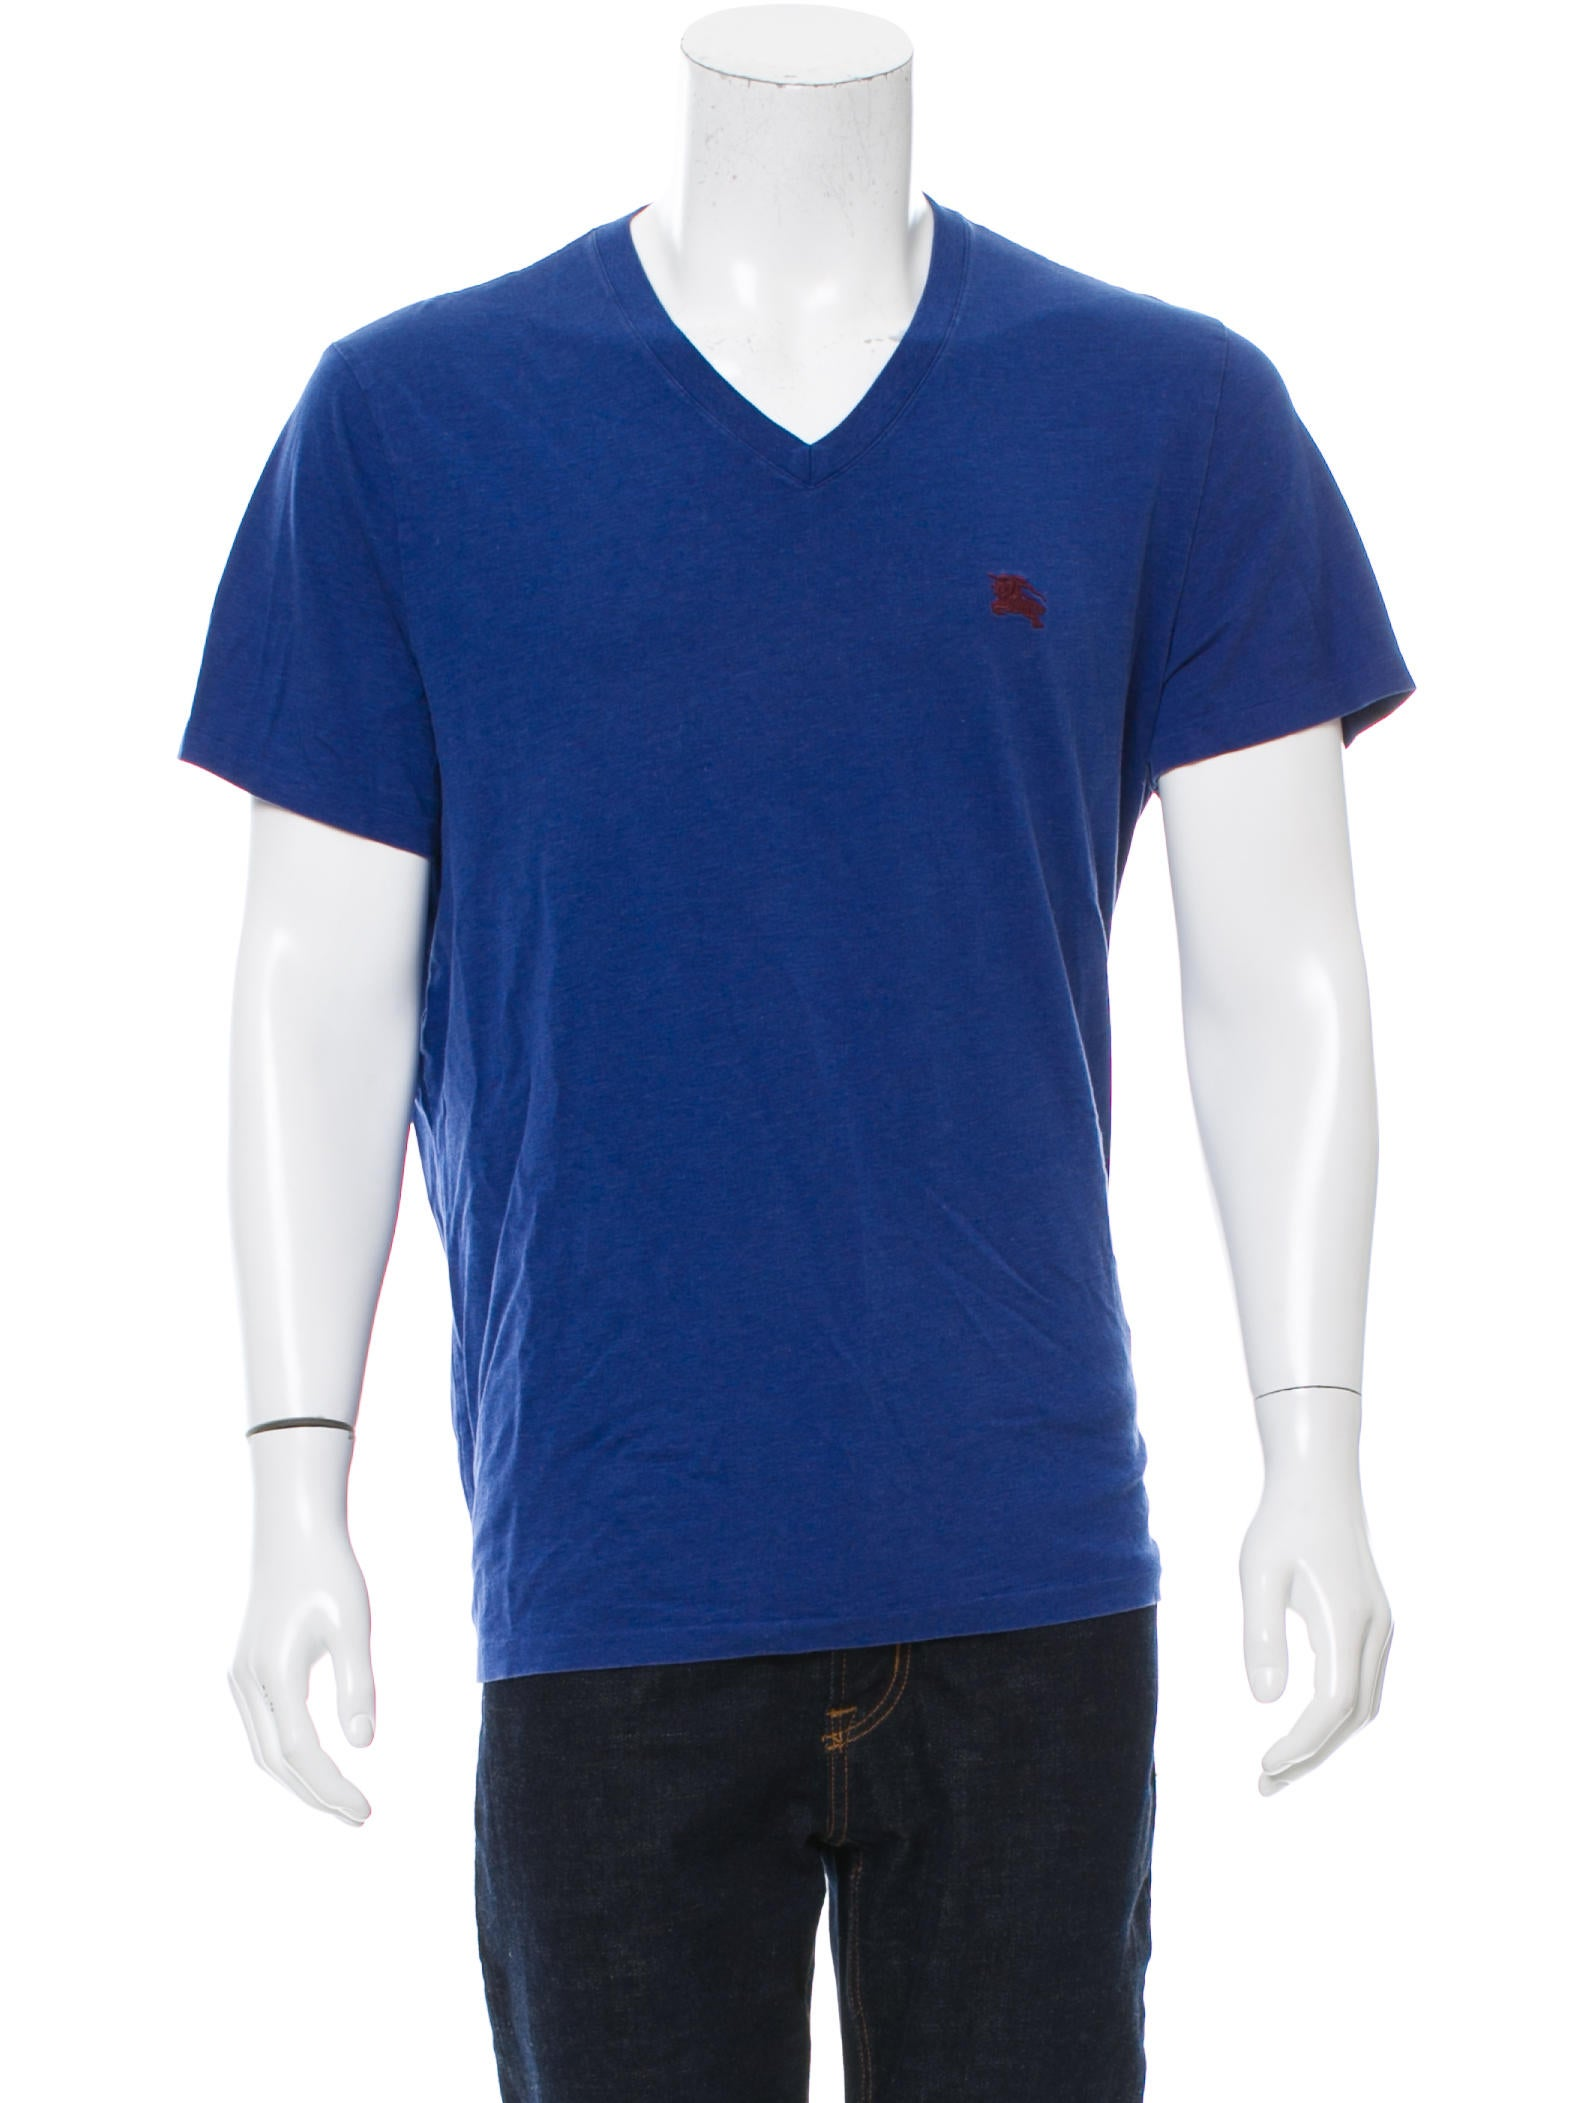 Burberry brit logo embroidered v neck t shirt clothing for T shirt logo embroidery